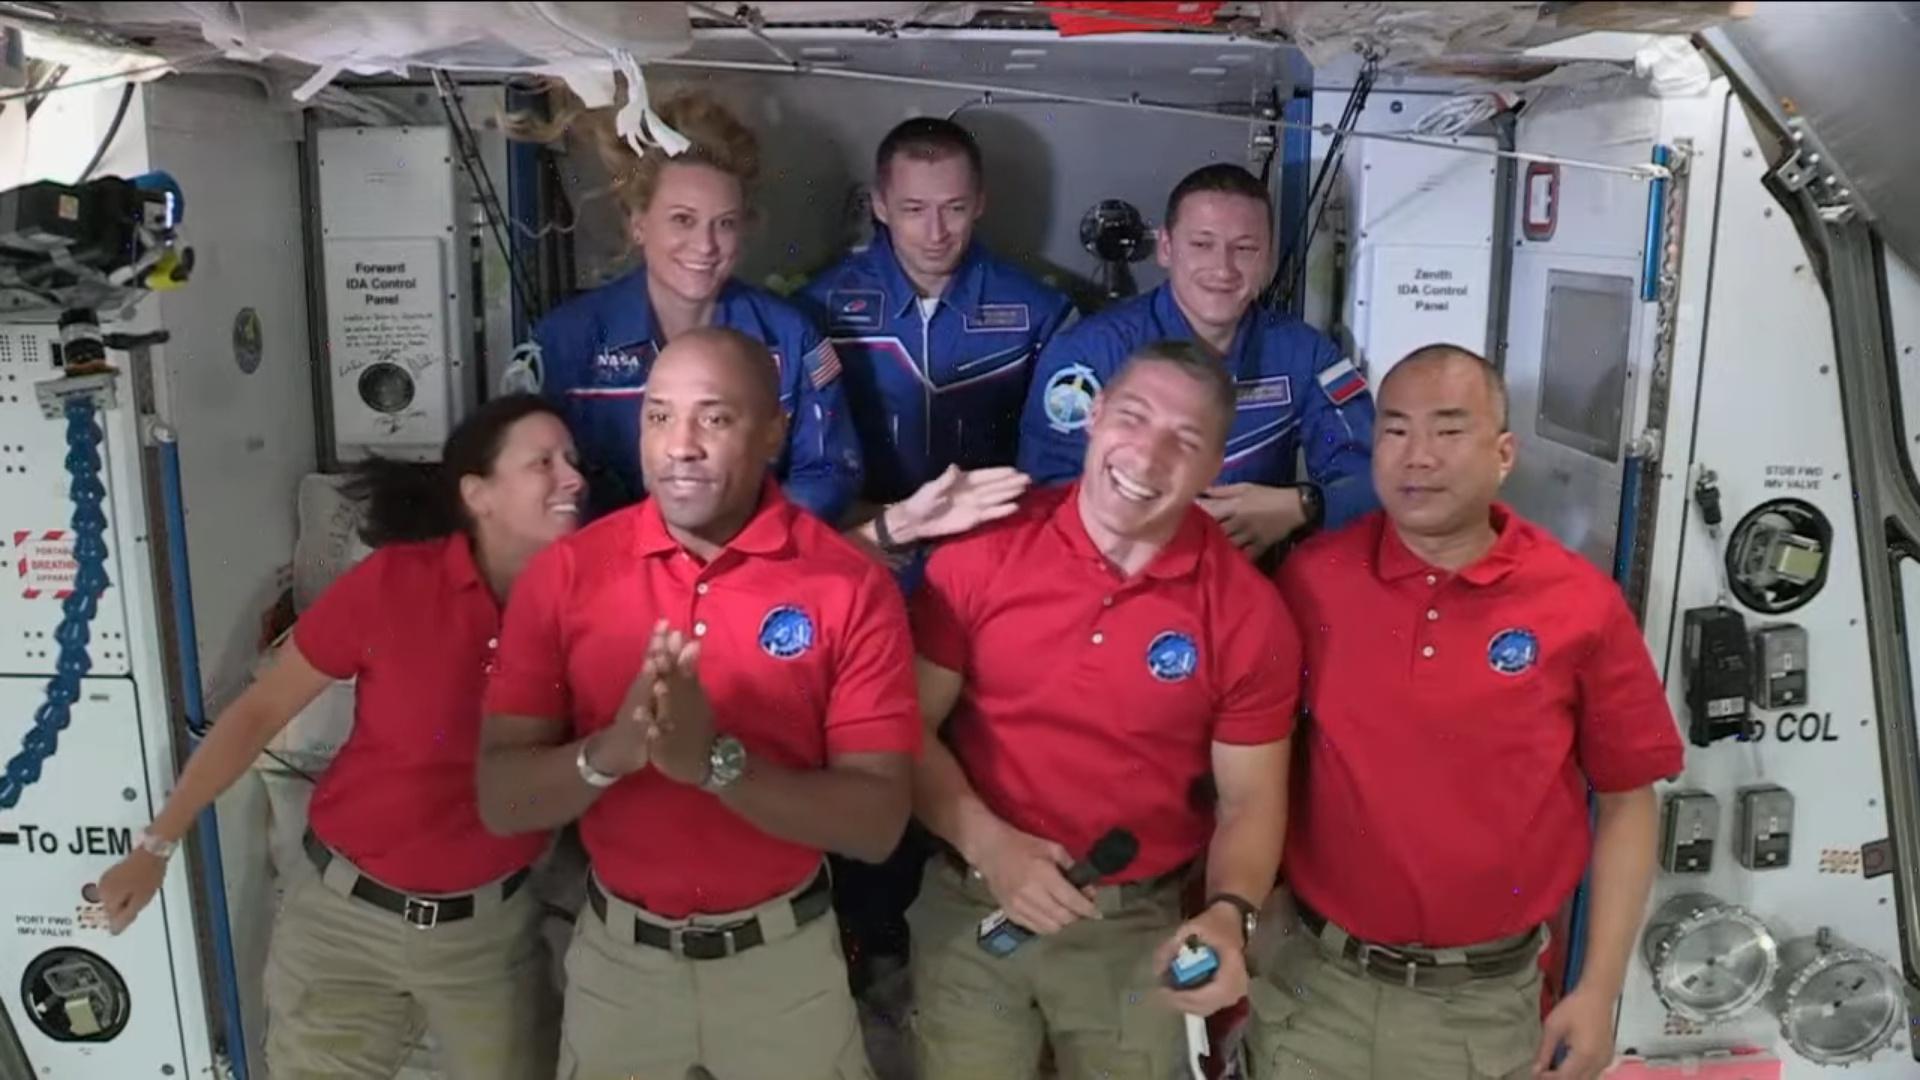 Crew-1 Crew Dragon C207 webcast 111620 (NASA) ingress 2